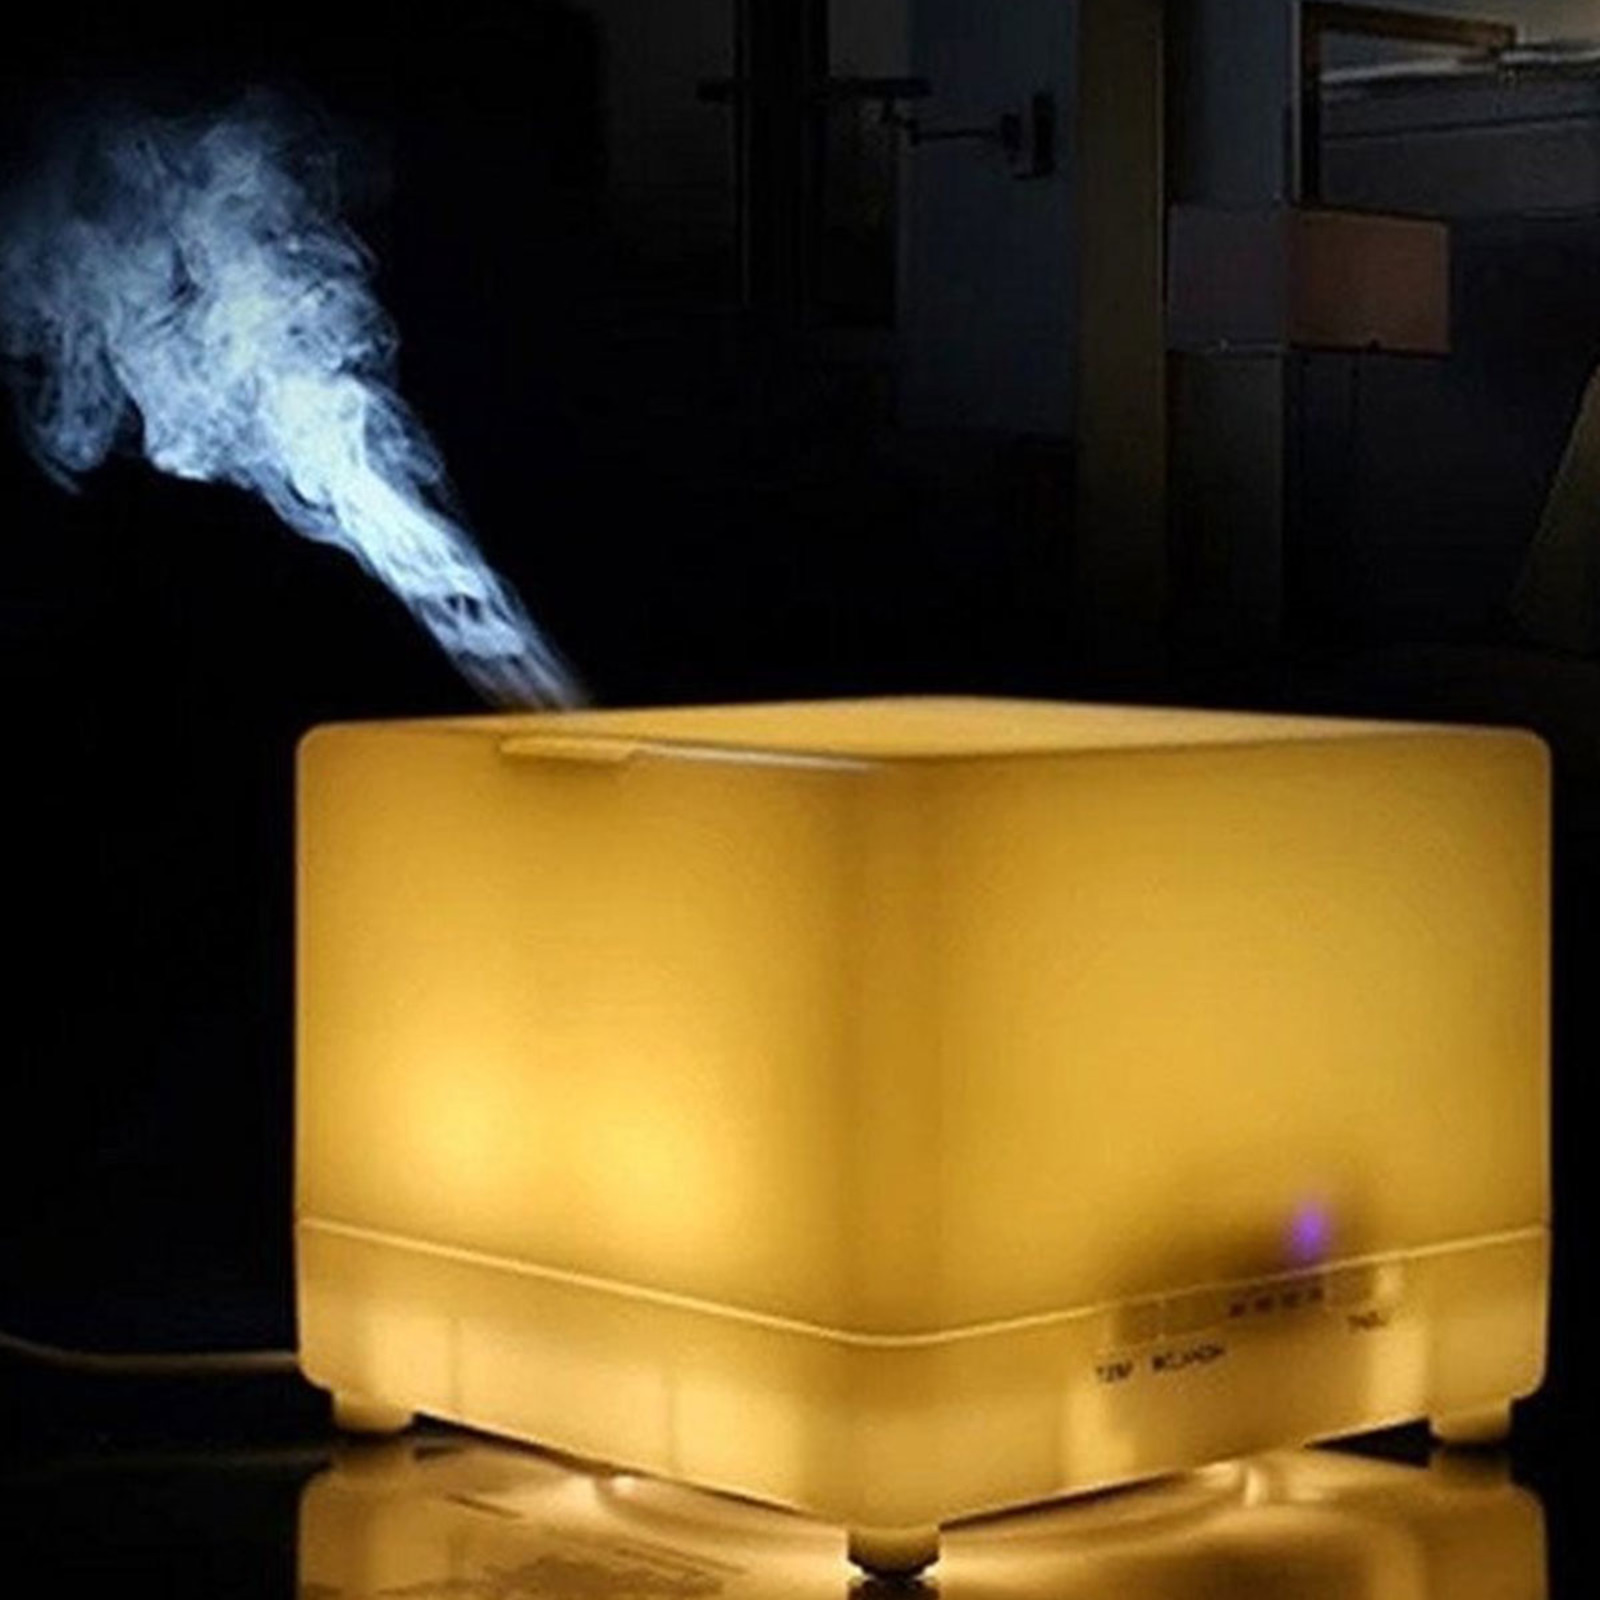 Biofinest I1 Ultrasonic Aroma Diffuser Humidifier